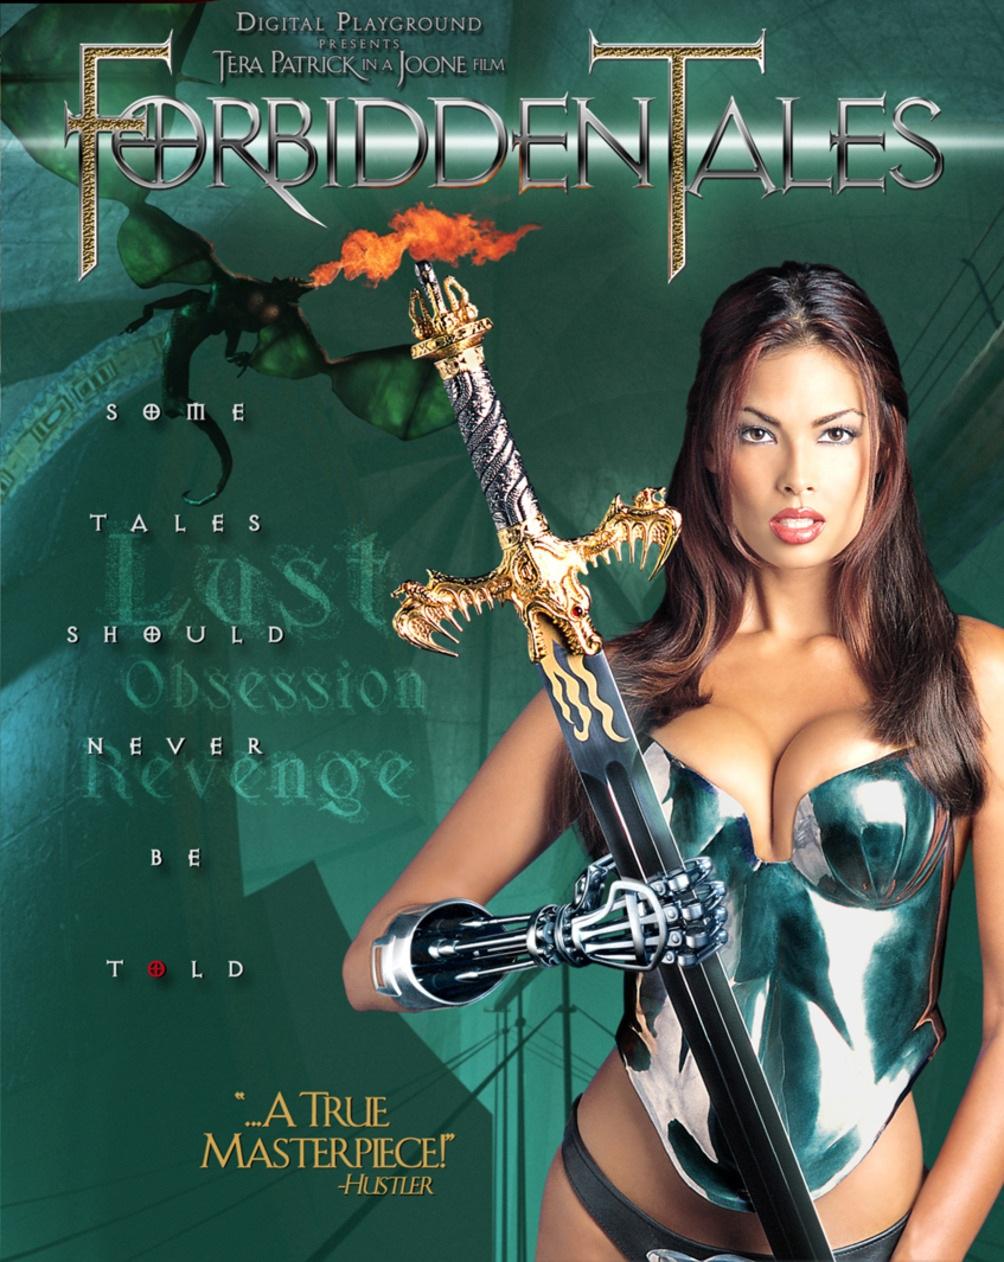 Forbidden Tales (2000) English DVDRip x264